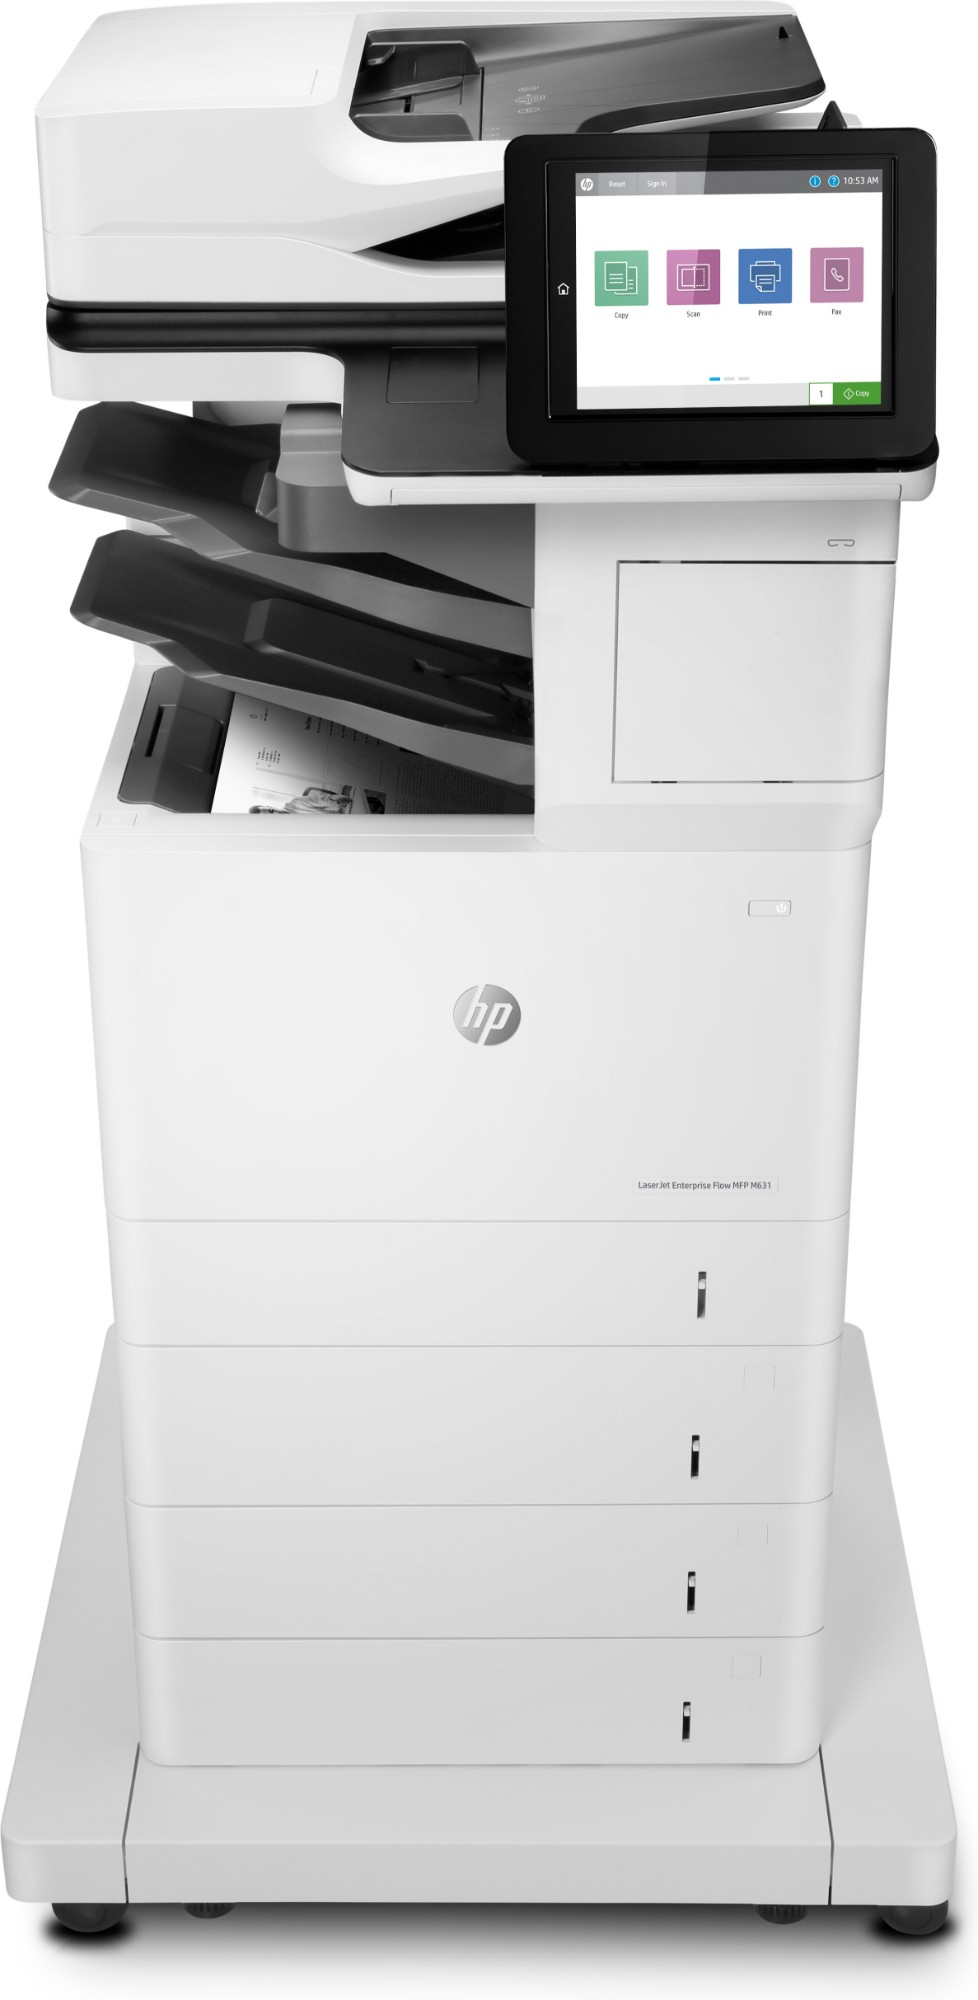 LaserJet Enterprise M631z - Multifunction Printer - Laser - A4 - USB / Ethernet / Wi-Fi